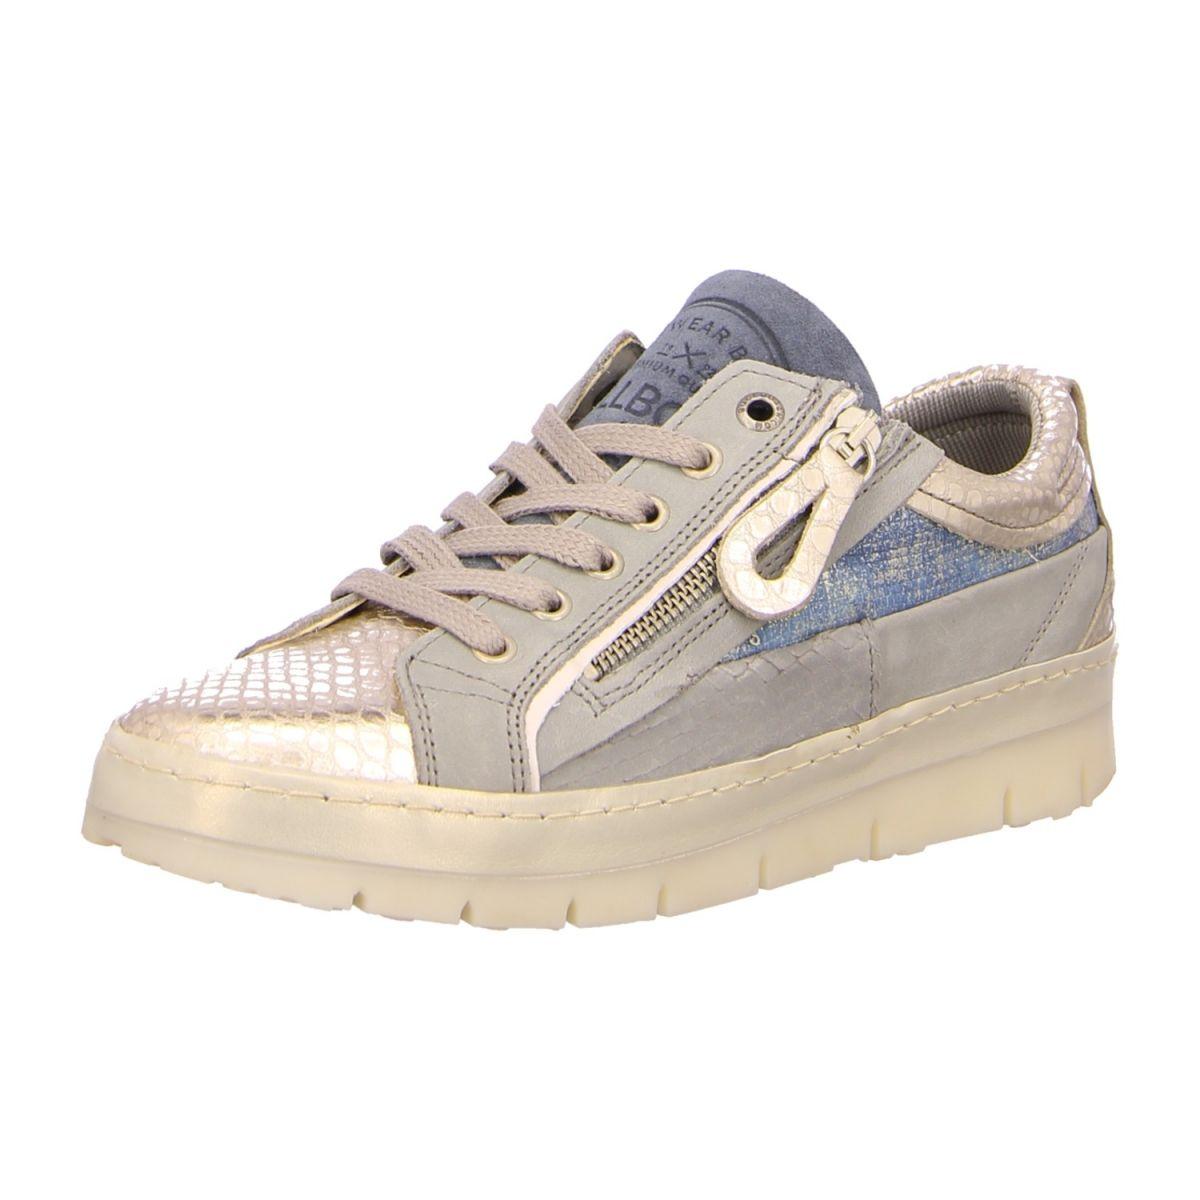 NEU: Rieker Sneaker L6247-15 - blau - | Schuhe & Accessoires | Pinterest |  Sneakers and Products